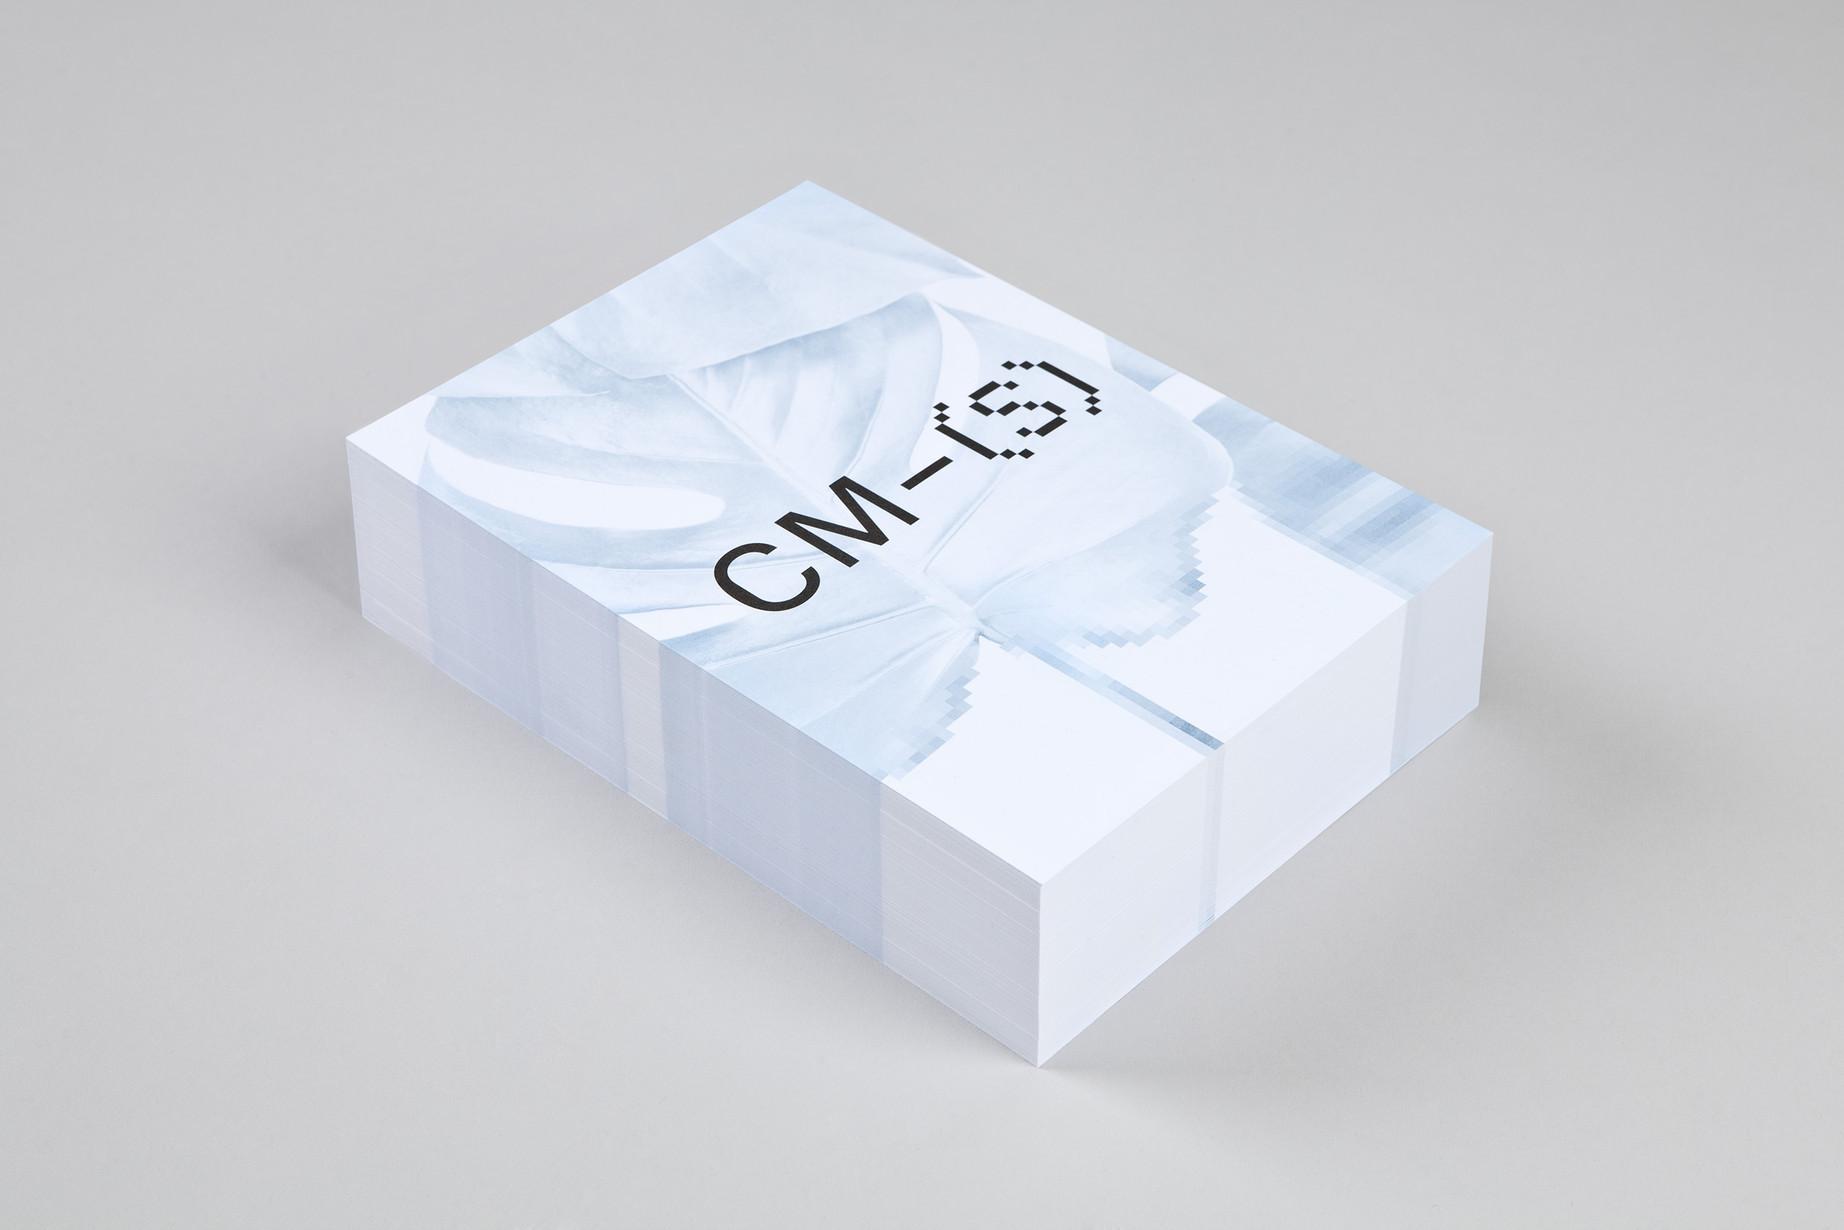 Critical Mass Studio / Lundgren & Lindqvist (9)